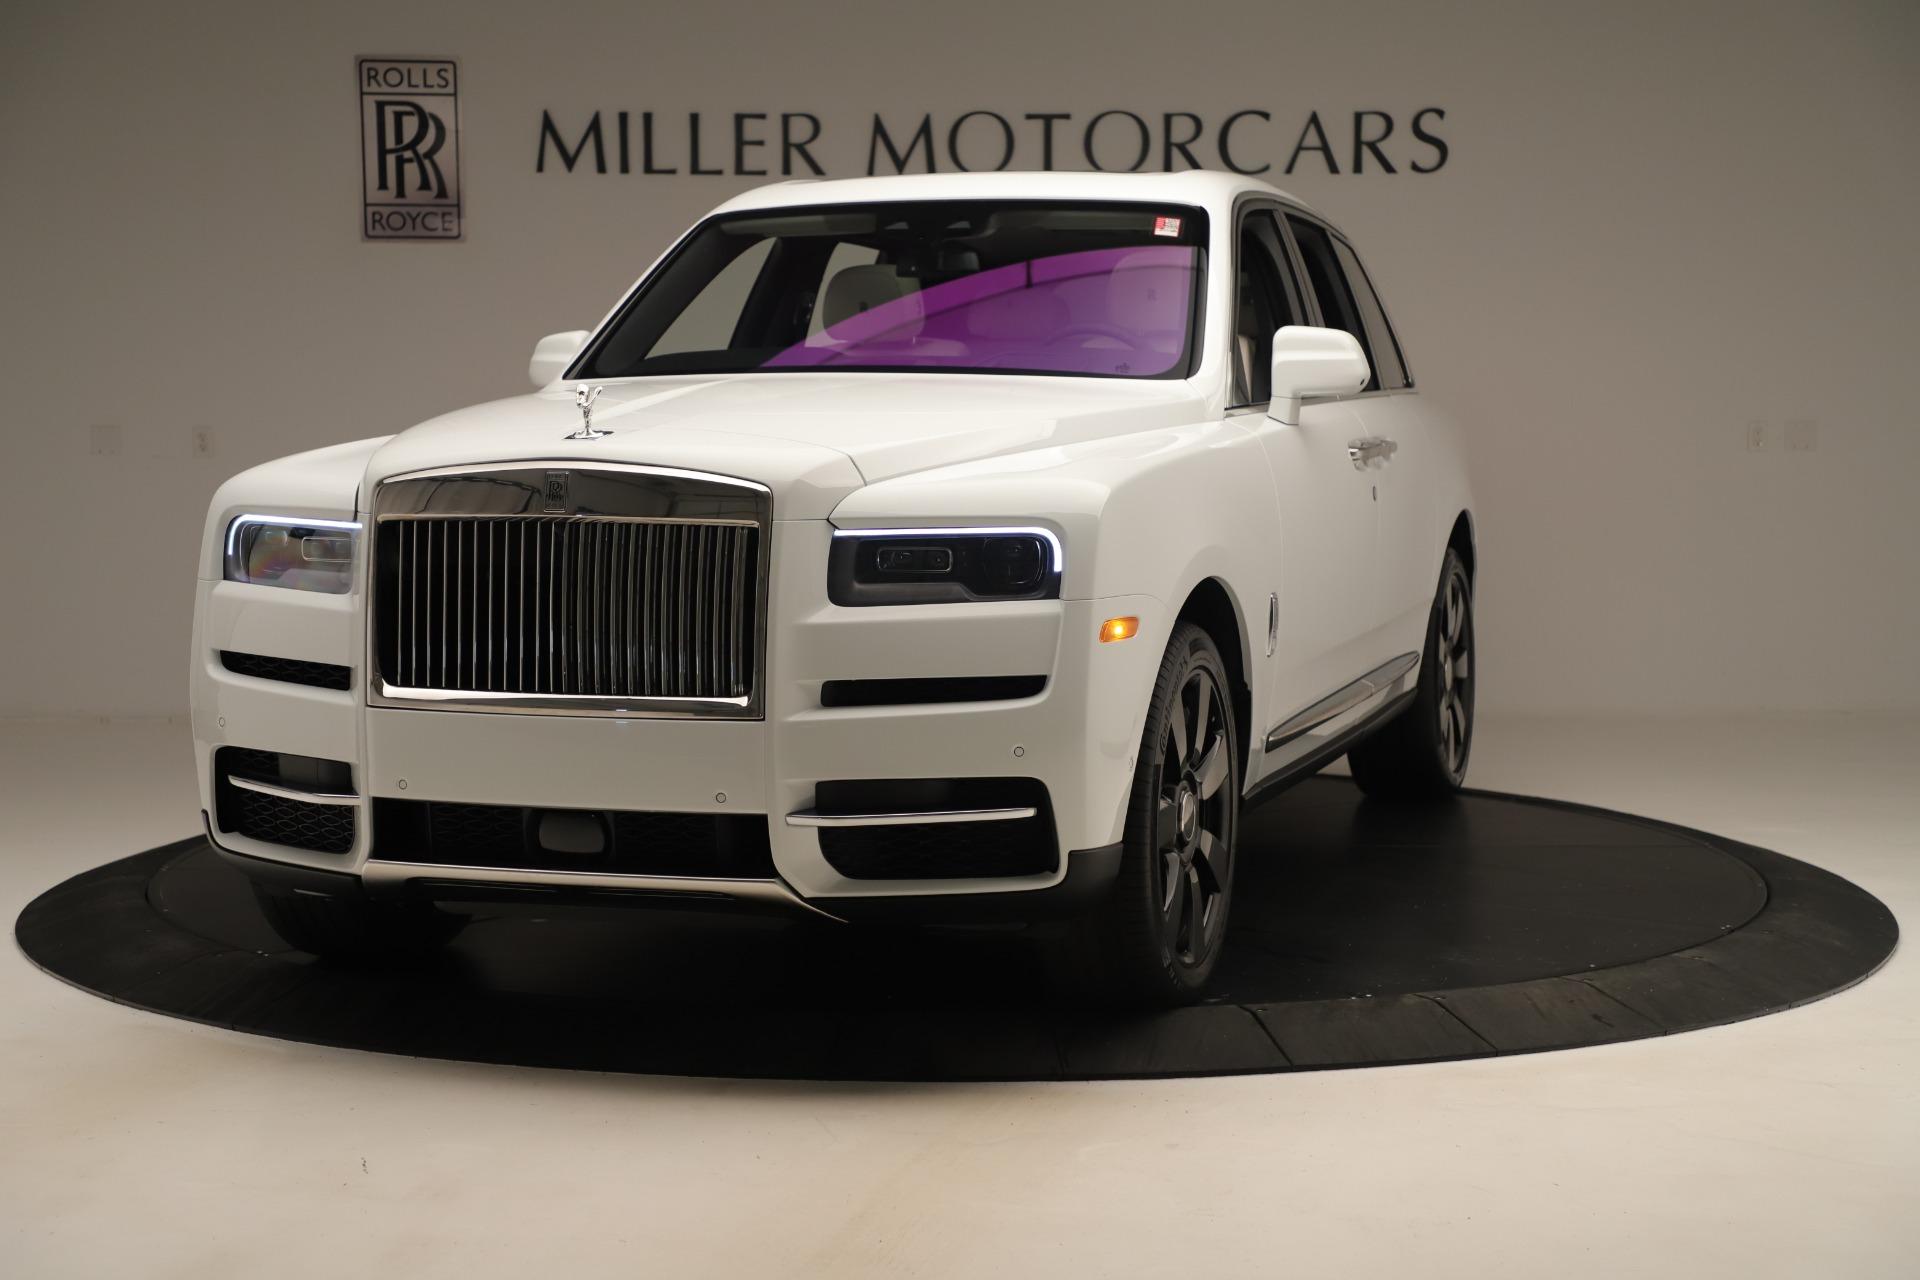 New 2019 Rolls-Royce Cullinan for sale Sold at Bugatti of Greenwich in Greenwich CT 06830 1